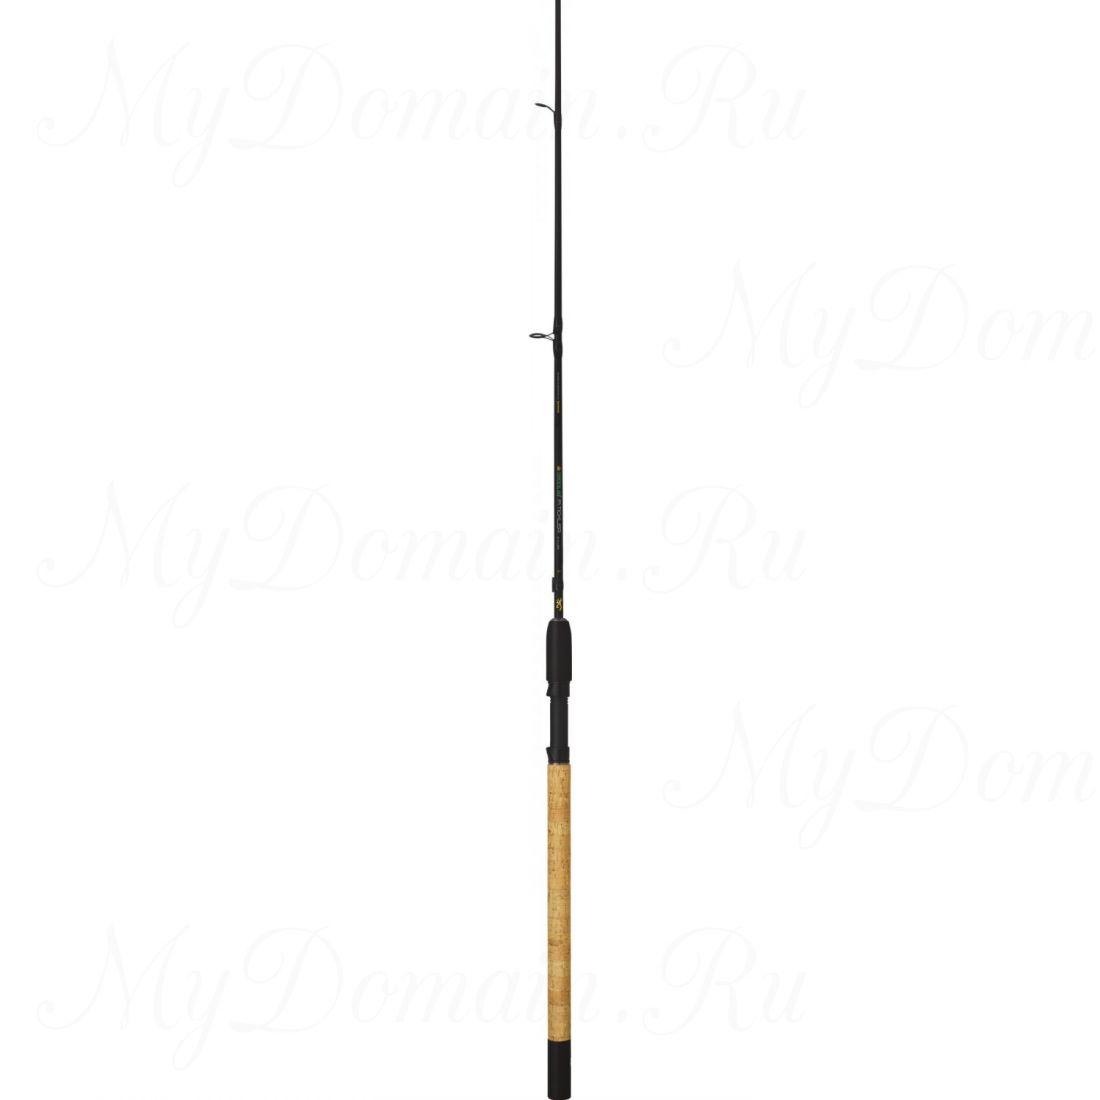 Удилище фидерное Browning Commercial King Carp Tickler 2,20m 35gr/2,4lbs